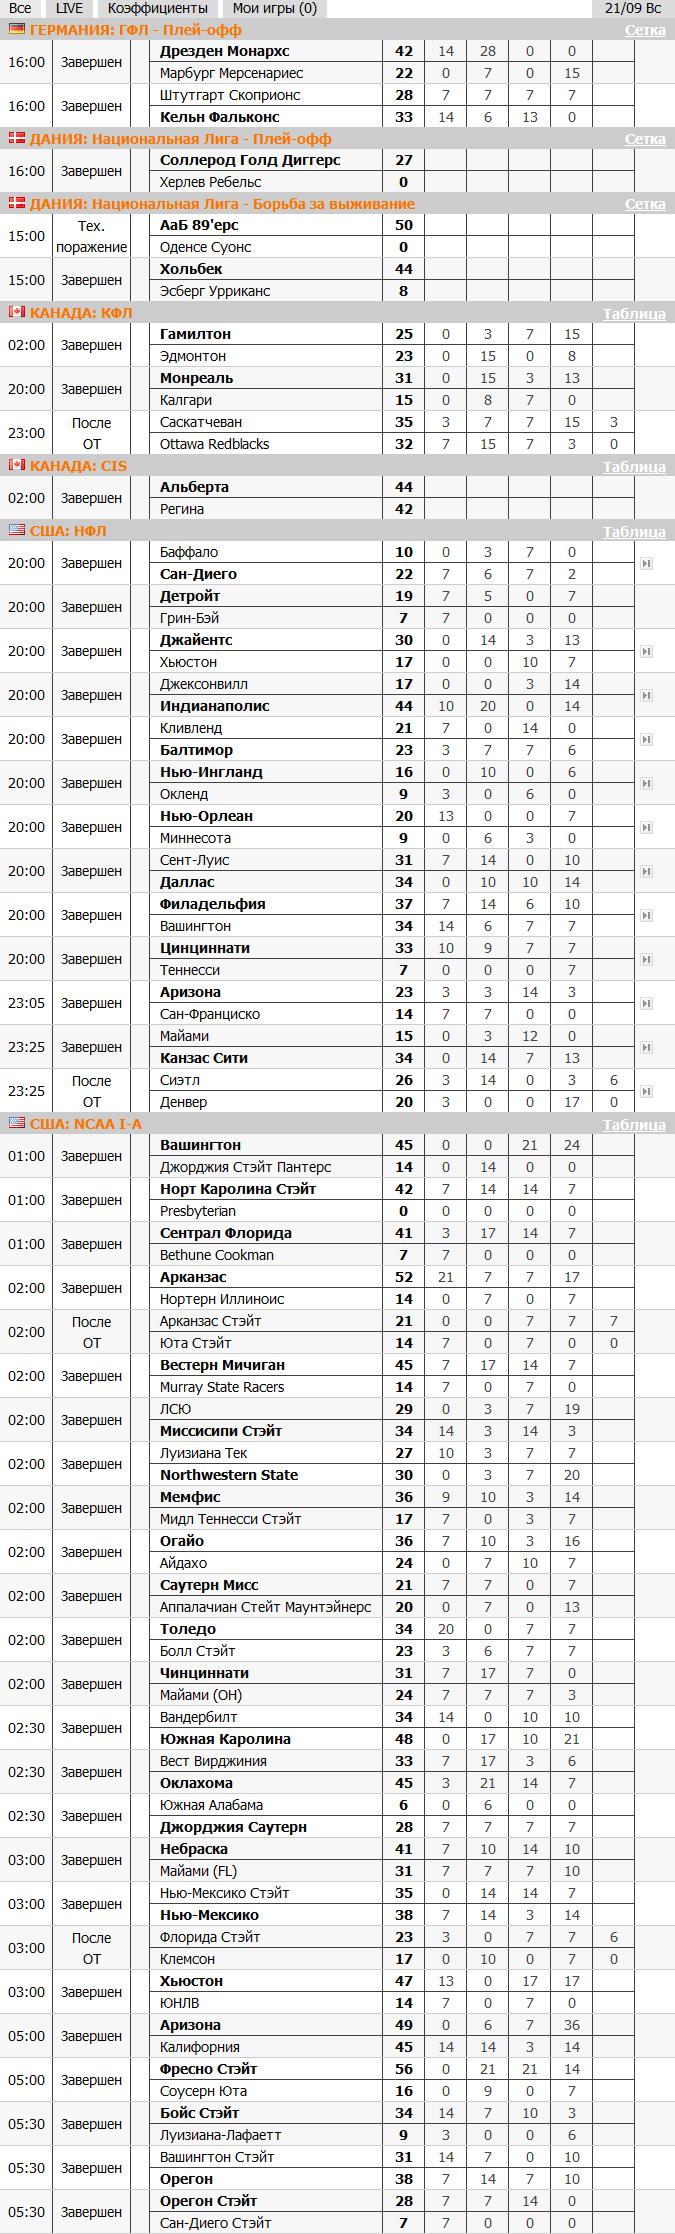 испанский чемпионат по футболу 2016-2017 турнирная таблица